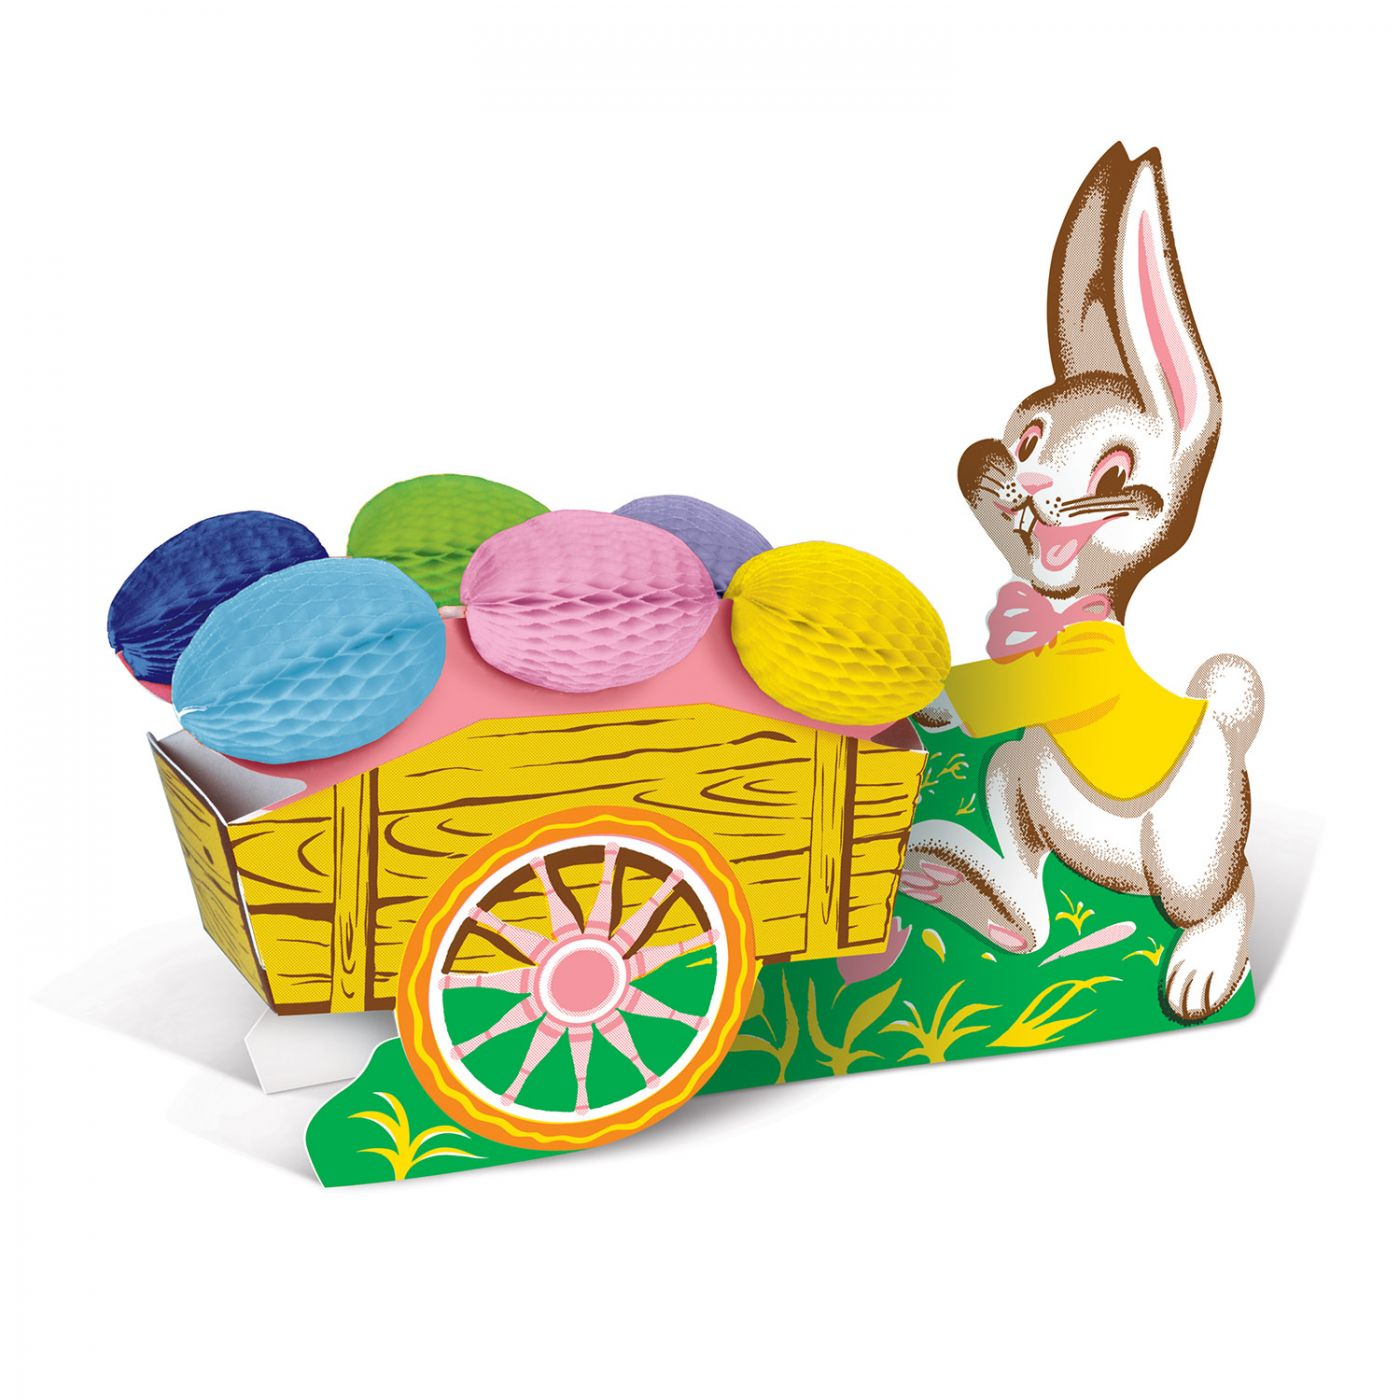 Vintage Easter Bunny w/Cart image